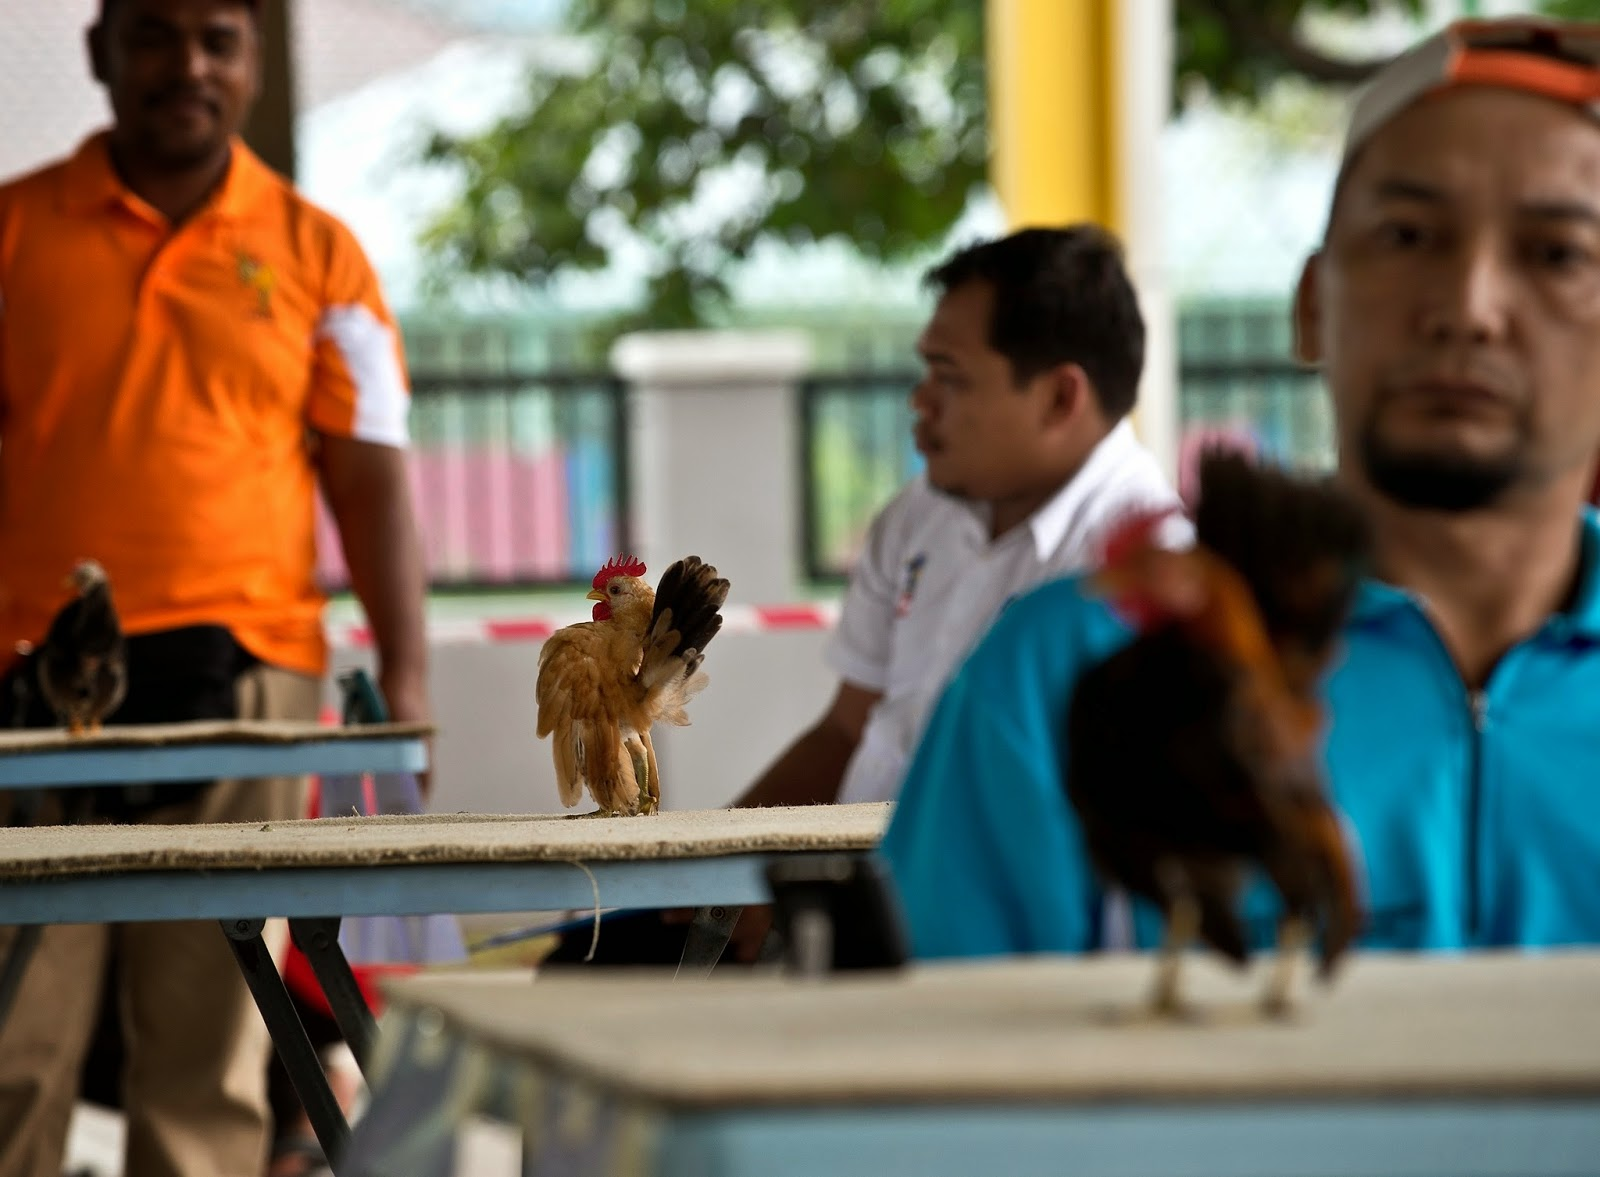 Animals, Animals Competitions, Beauty Contest, Beauty Pageant, Chicken Beauty Pageant, Kuala Lumpur, Lifestyle, Malaysia, Offbeat, Poultry, Serama Chicken, Serama Chicken Beauty Contest, Seramas,